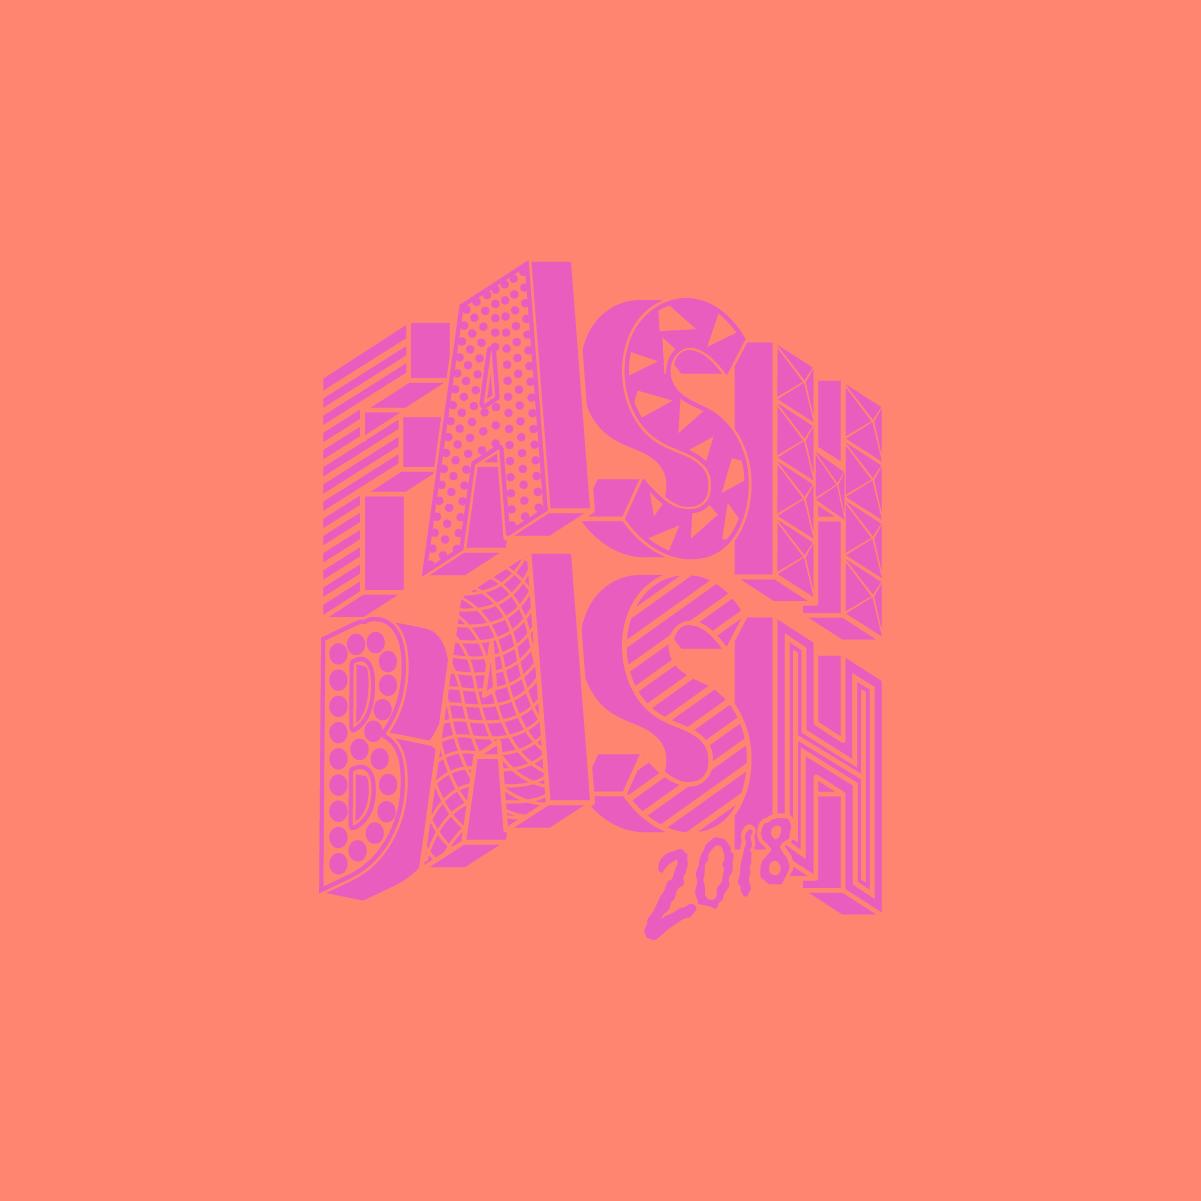 FashBash_headers_03-03